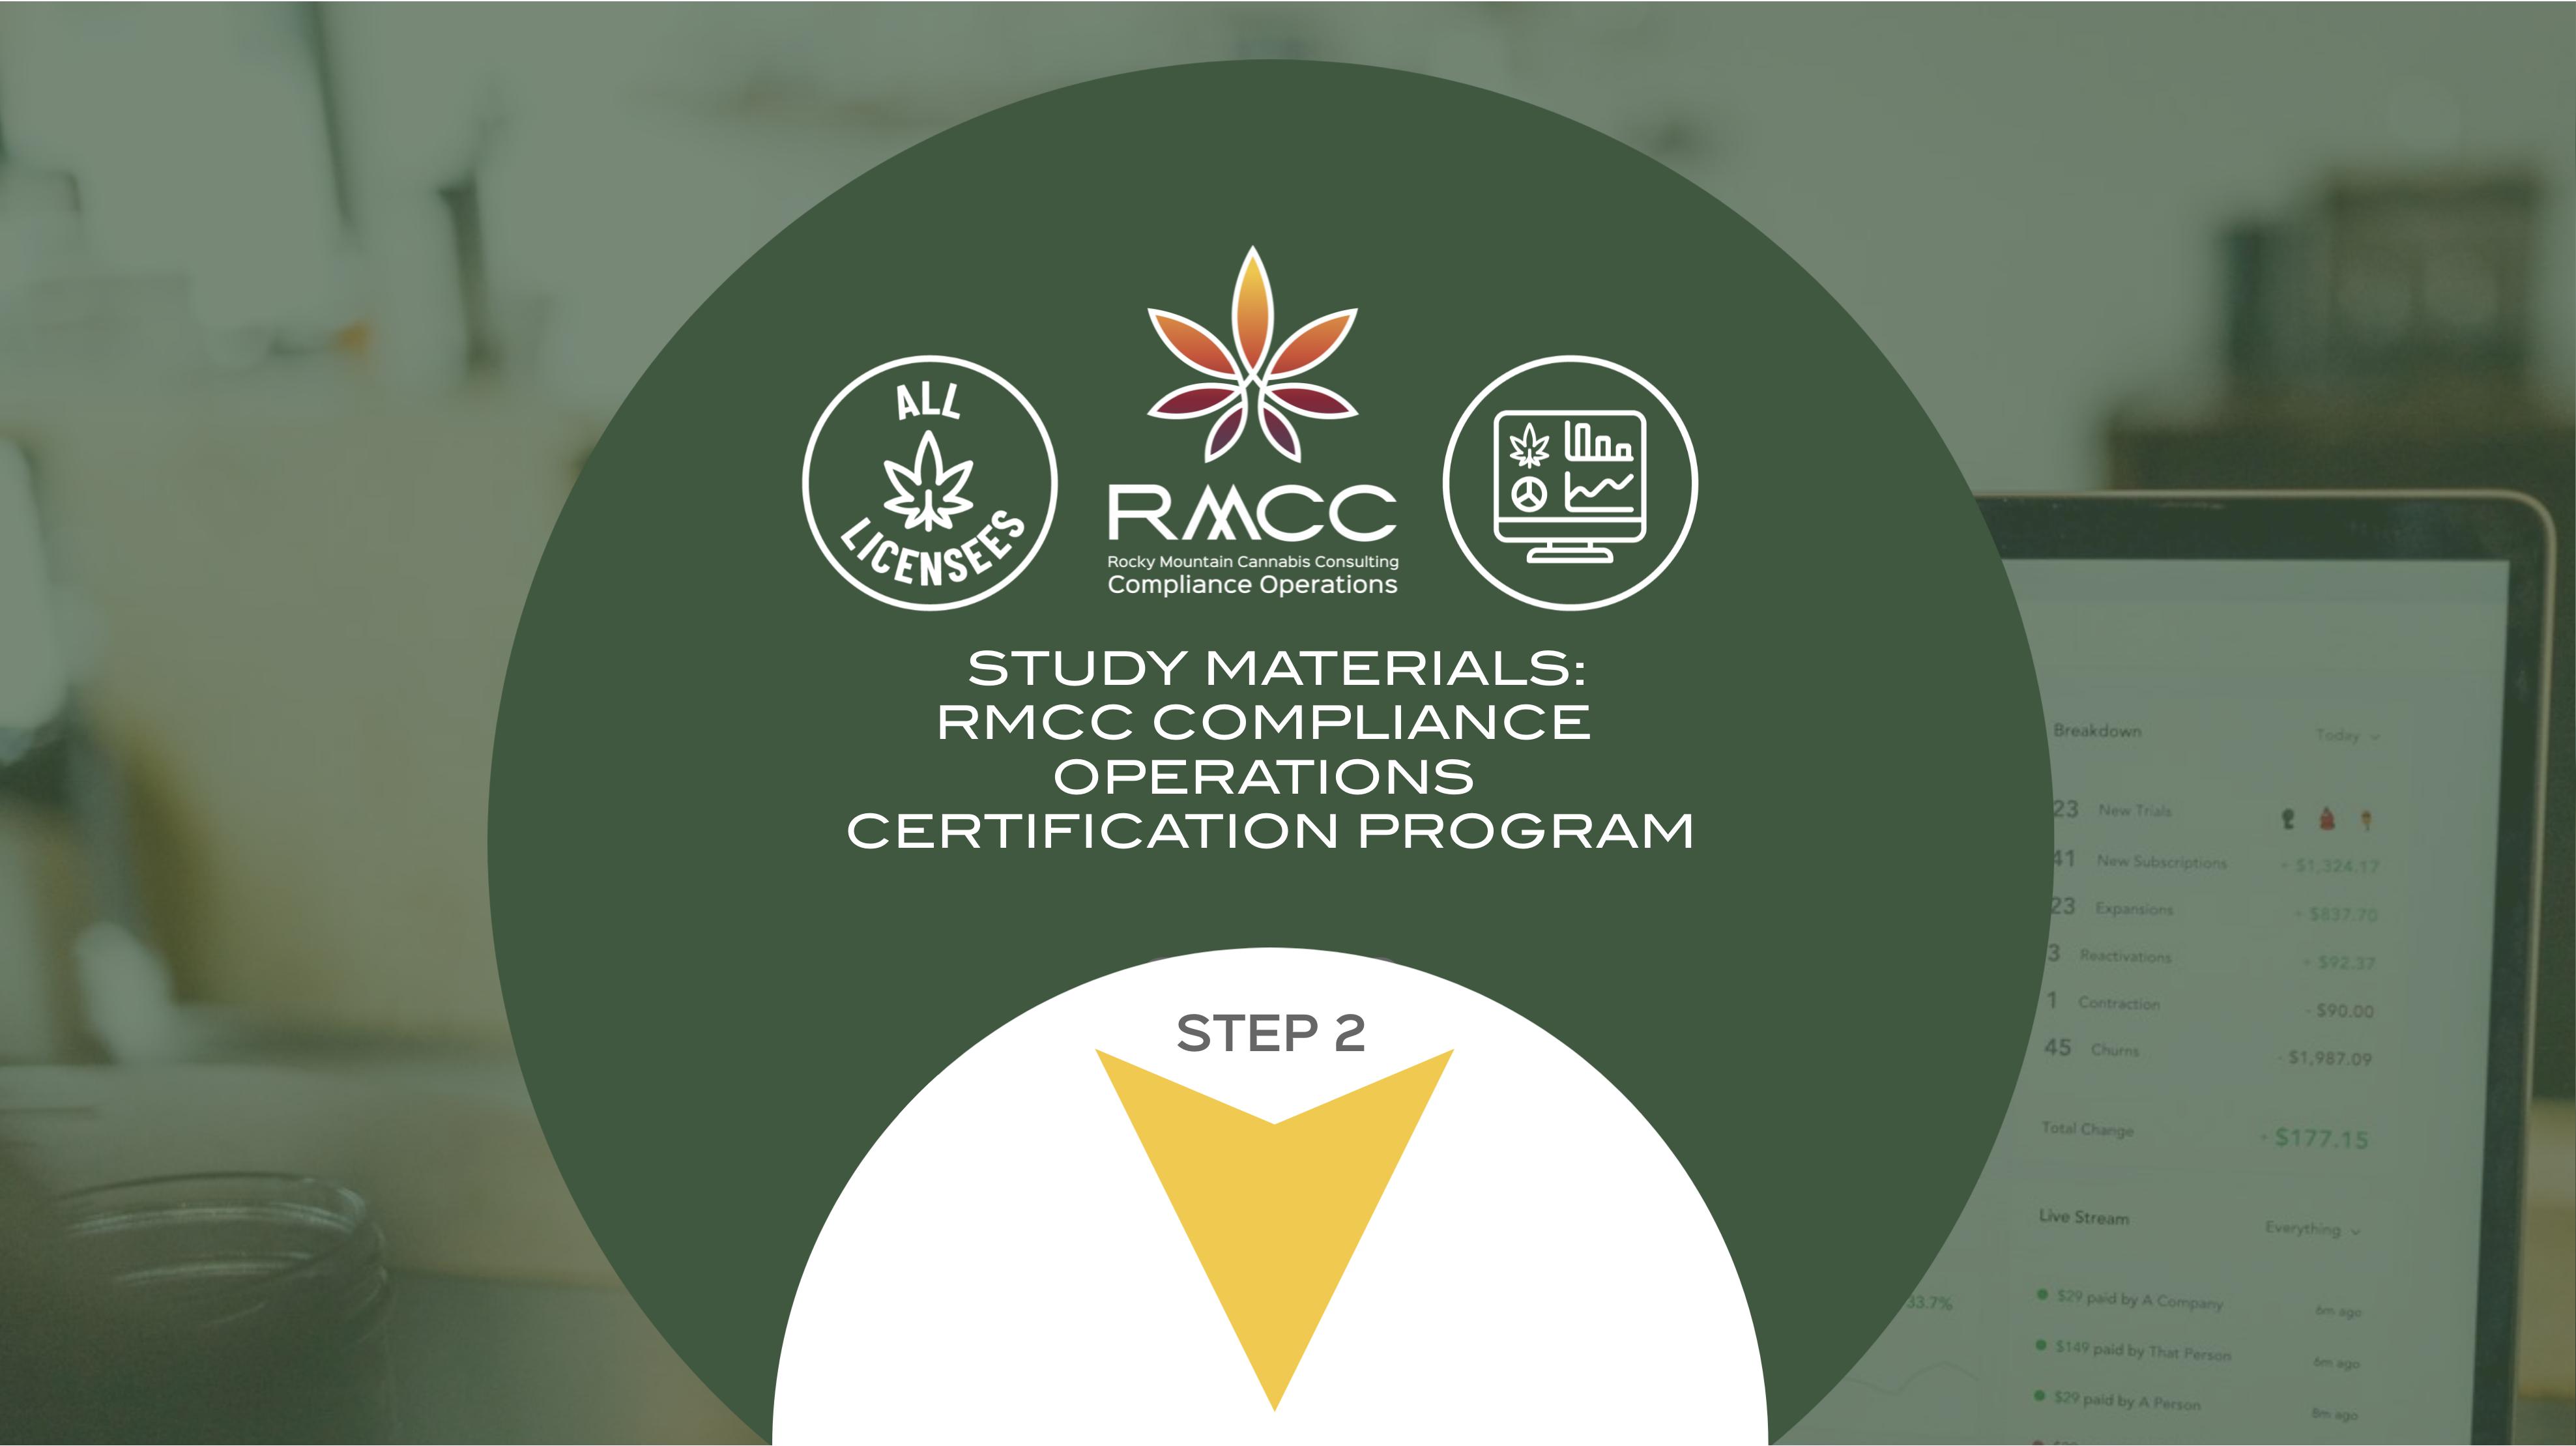 RMCC METRC tickets, METRC training, Oklahoma cannabis, Maine Cannabis, Oregon Cannabis, coronavirus, cannabis certification